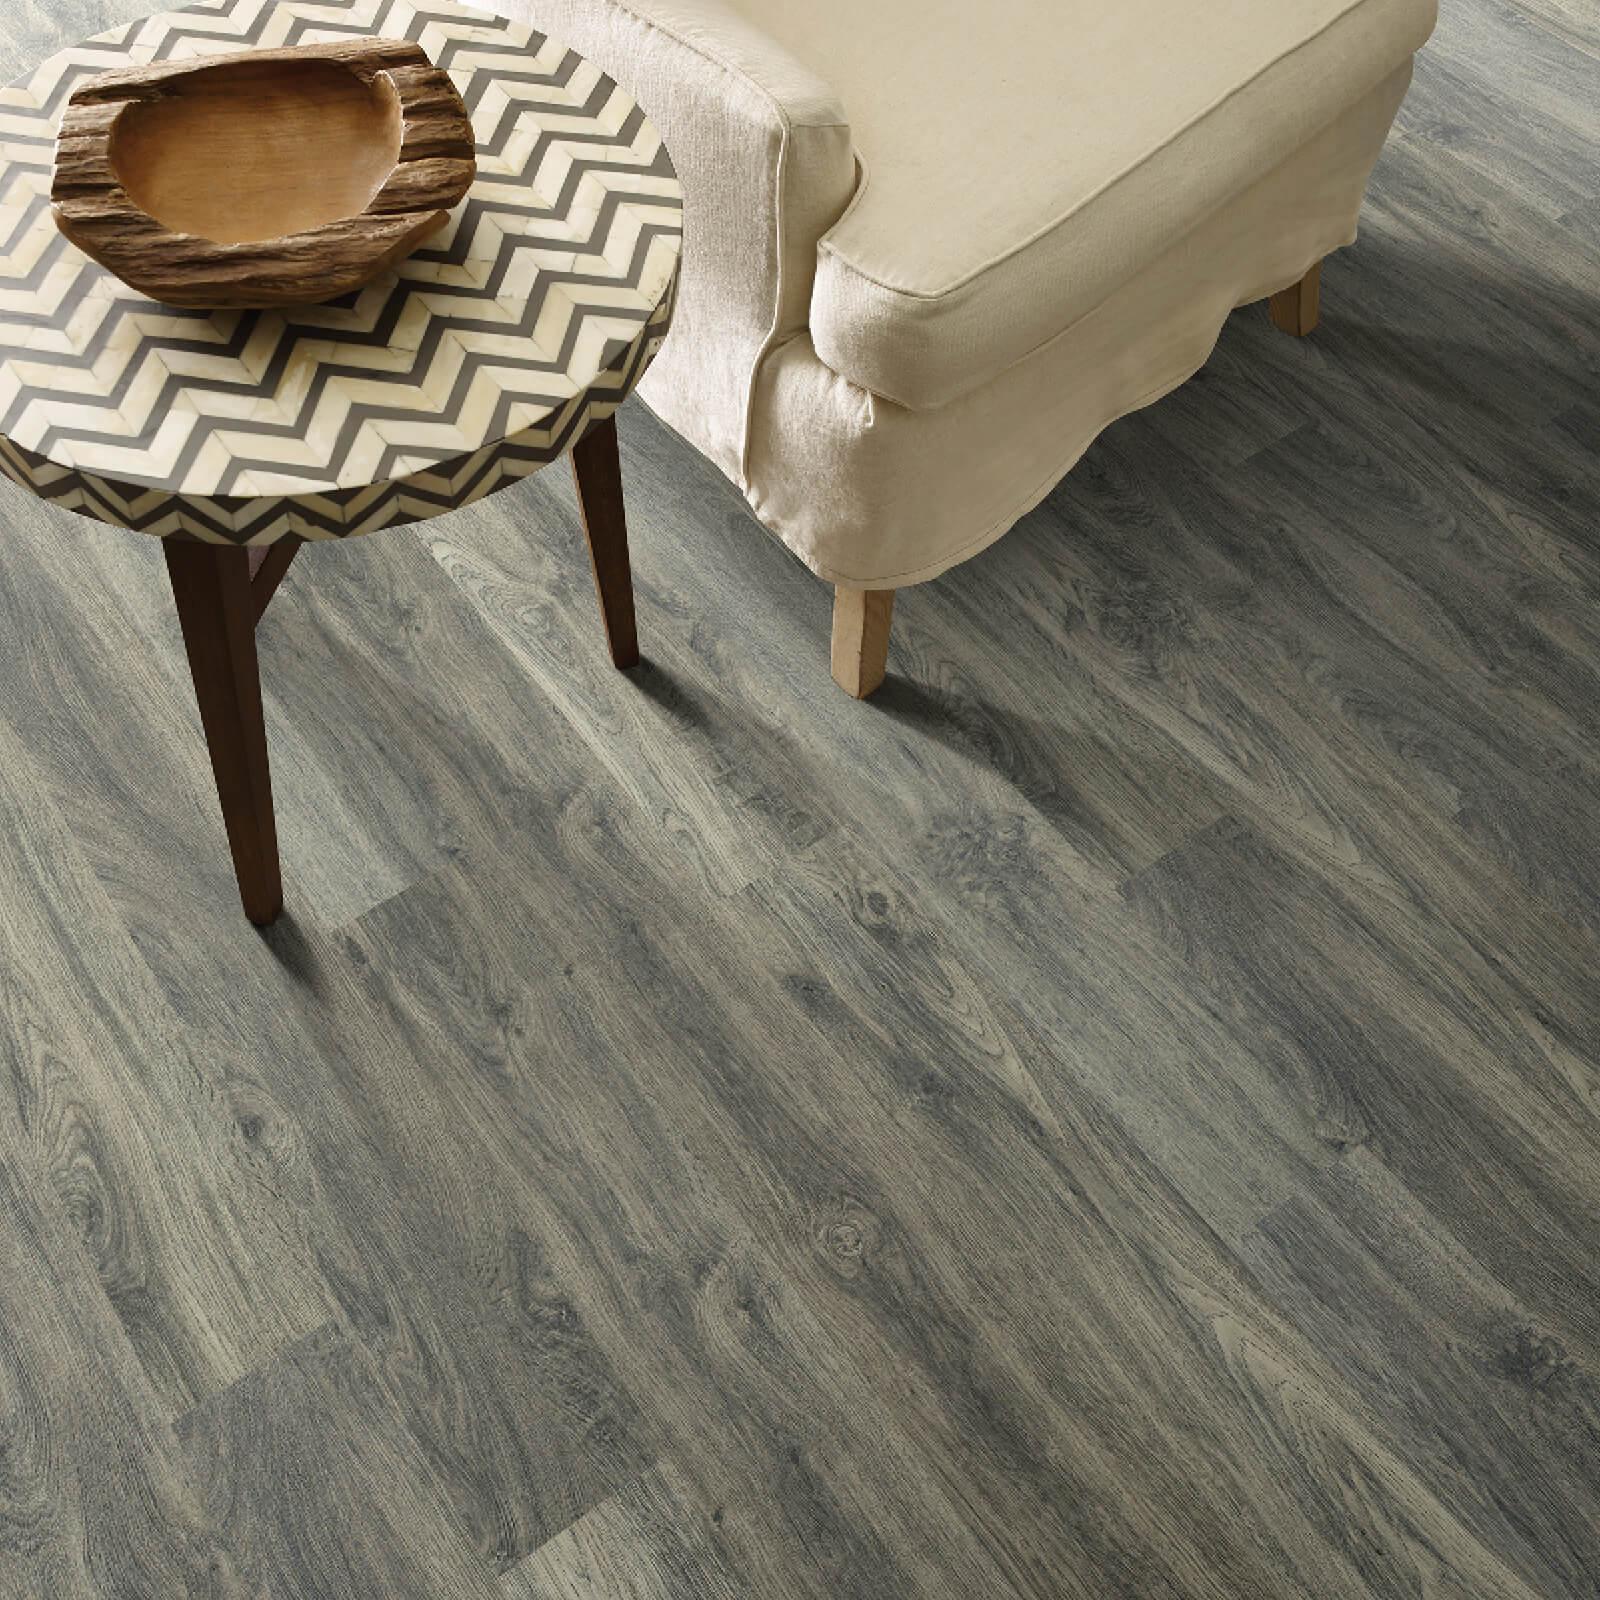 Laminate flooring | Mill Direct Floor Coverings